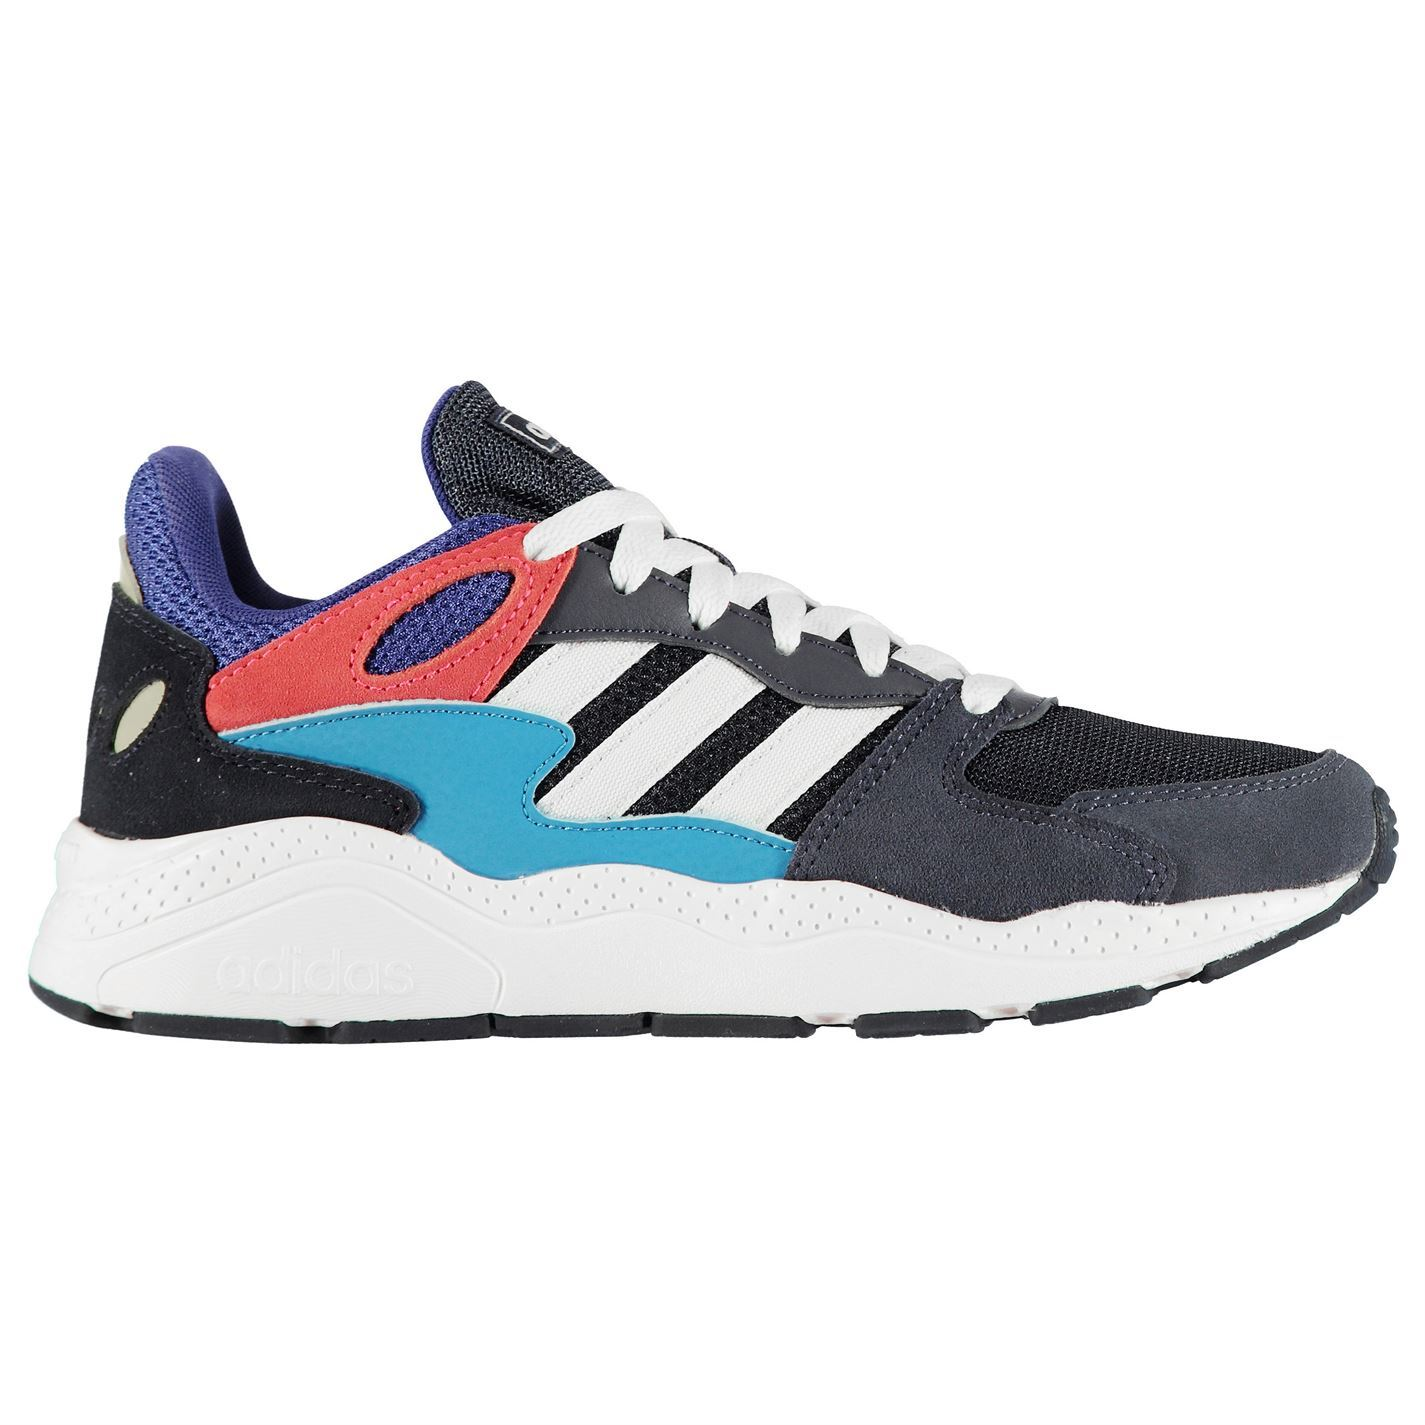 Adidas-Crazychaos-Baskets-Homme-Chaussures-De-Loisirs-Chaussures-Baskets miniature 23